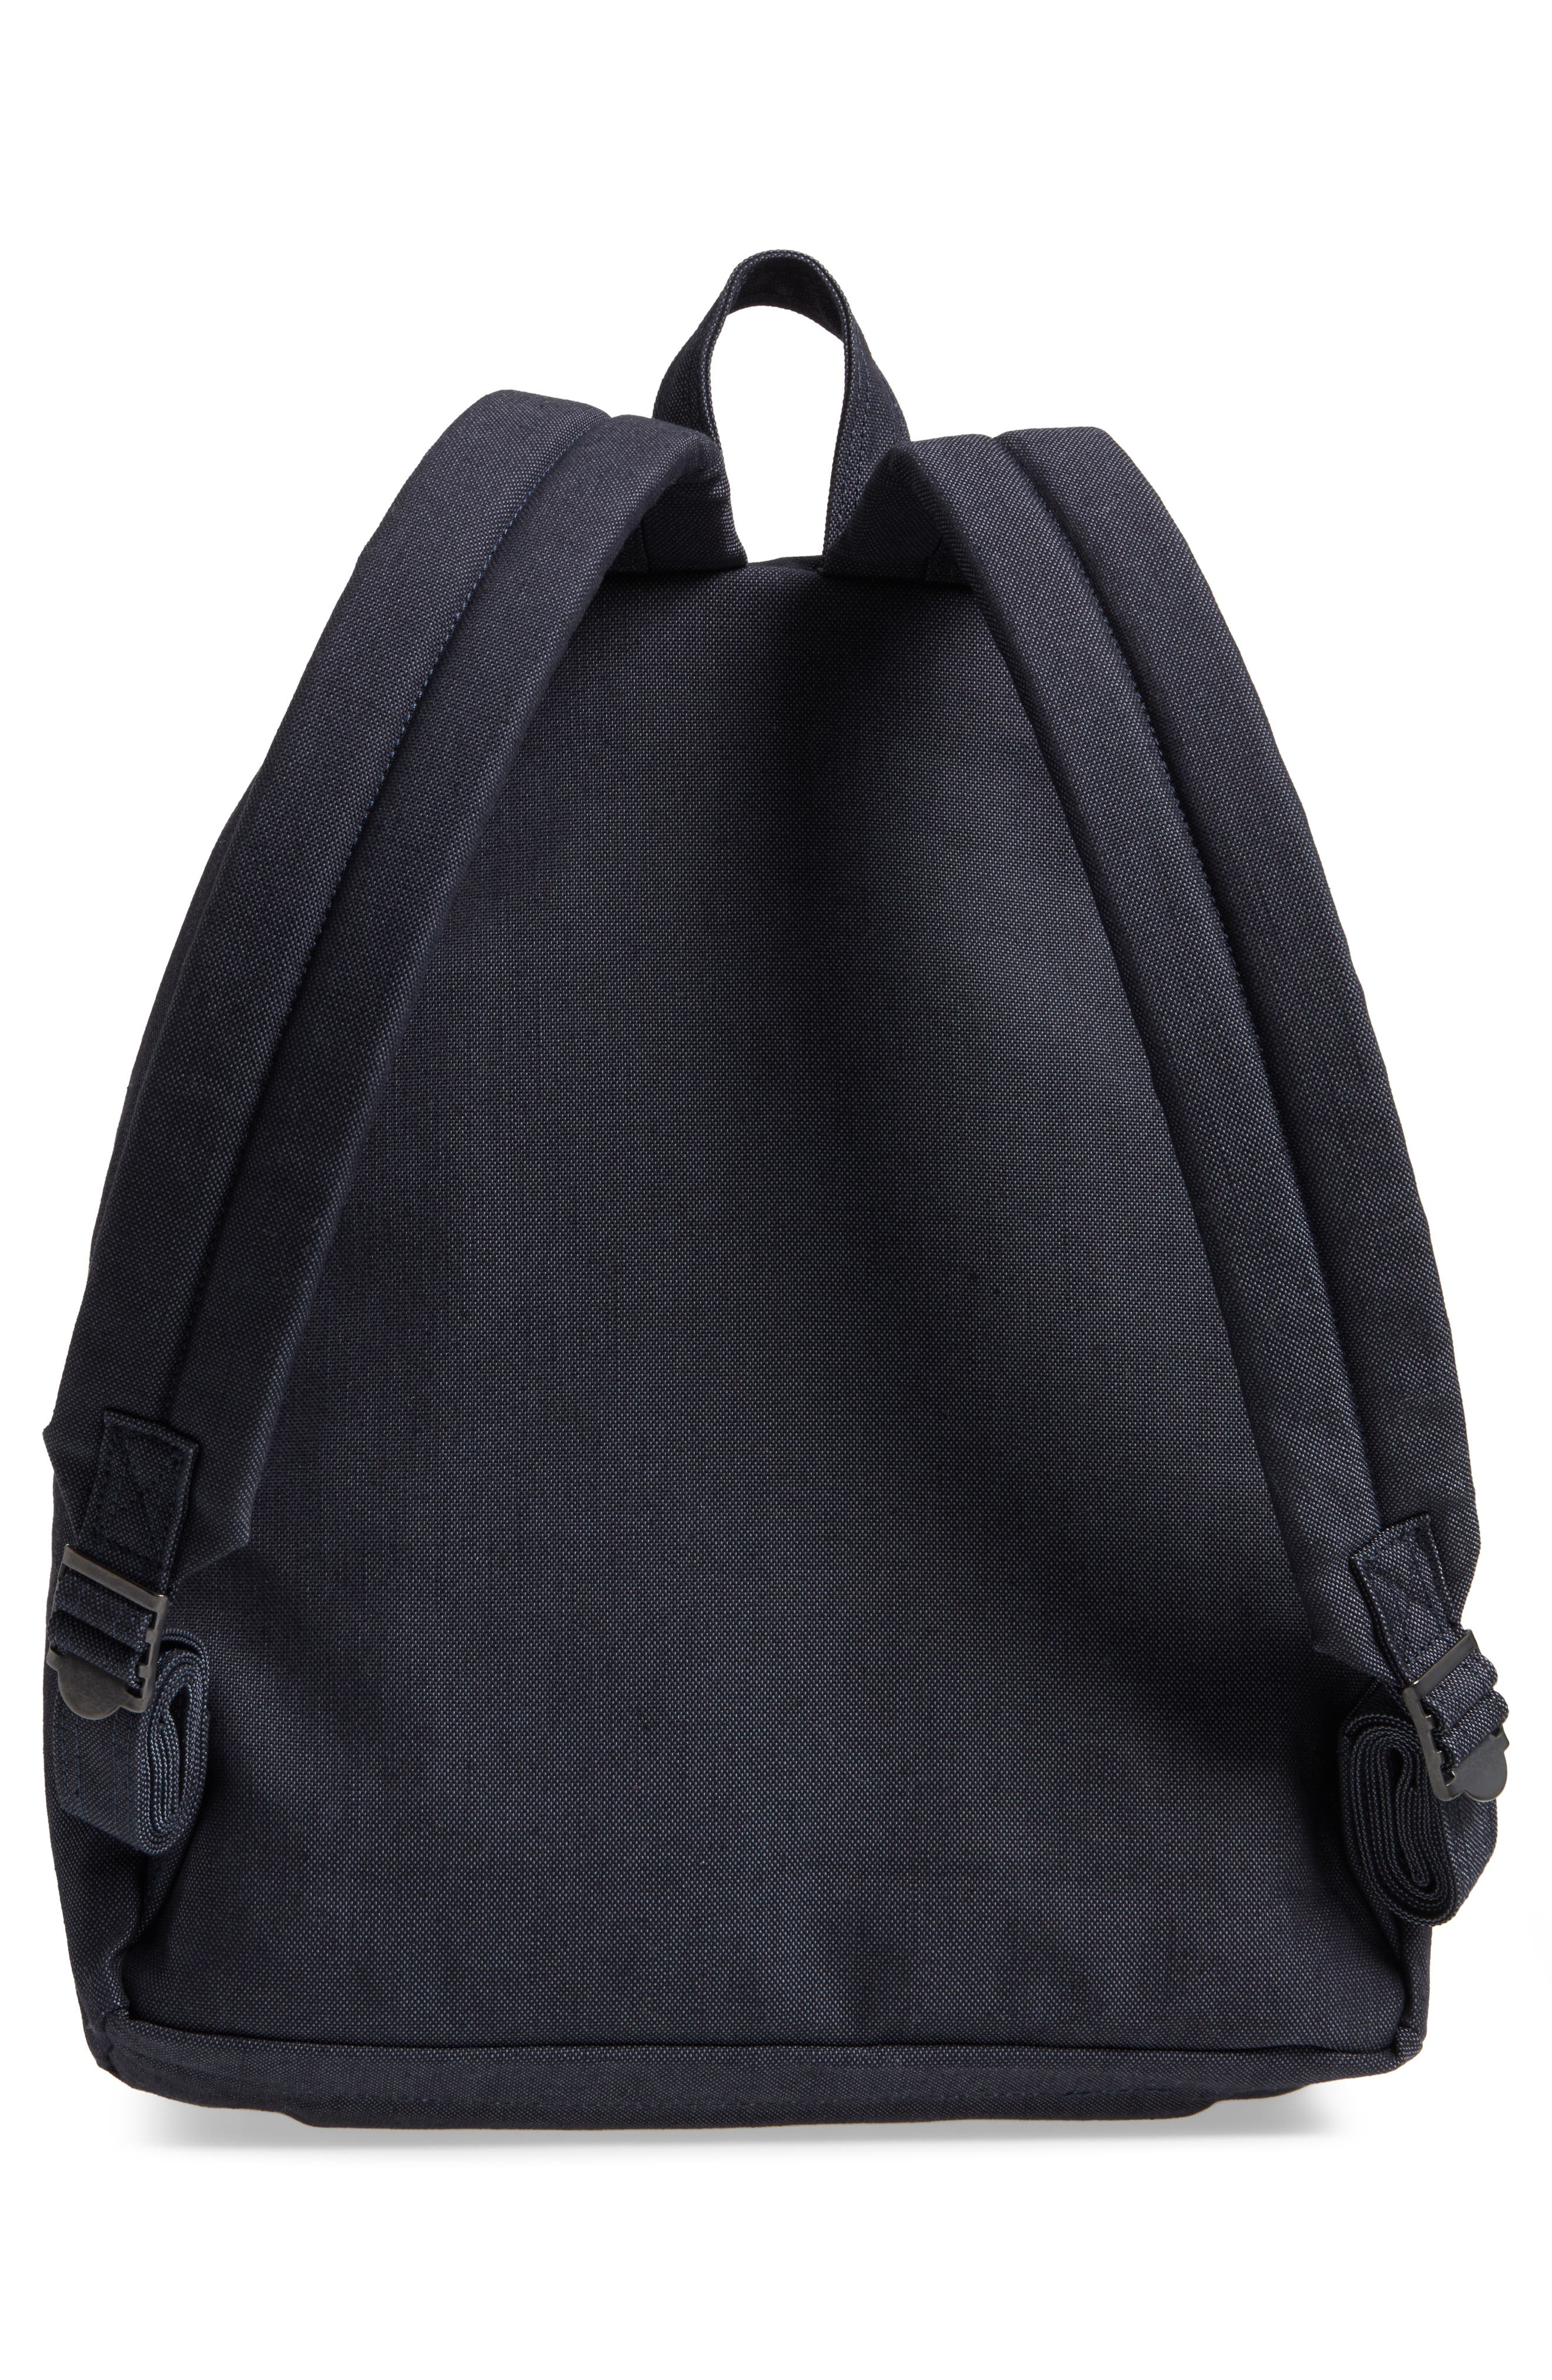 Porter-Yoshida & Co. Smoky Backpack,                             Alternate thumbnail 3, color,                             400